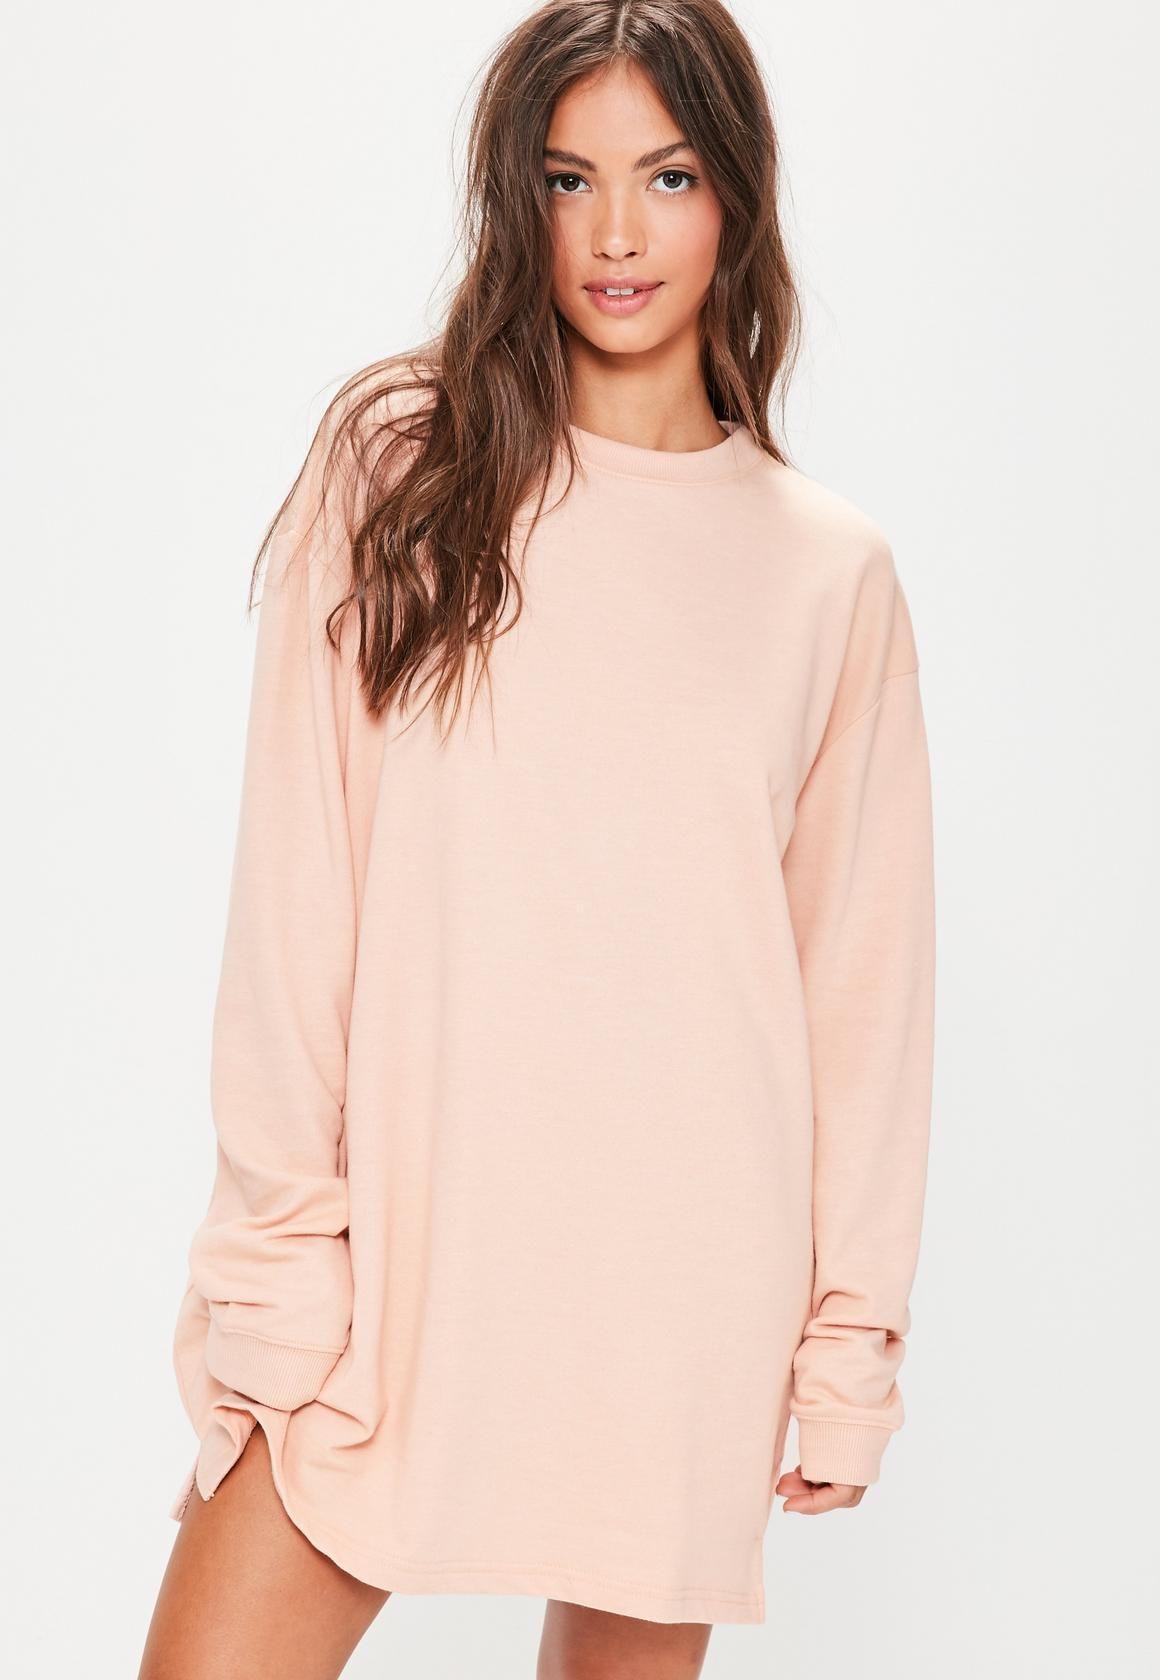 99e77bde103 Missguided - oversized sweater dress nude